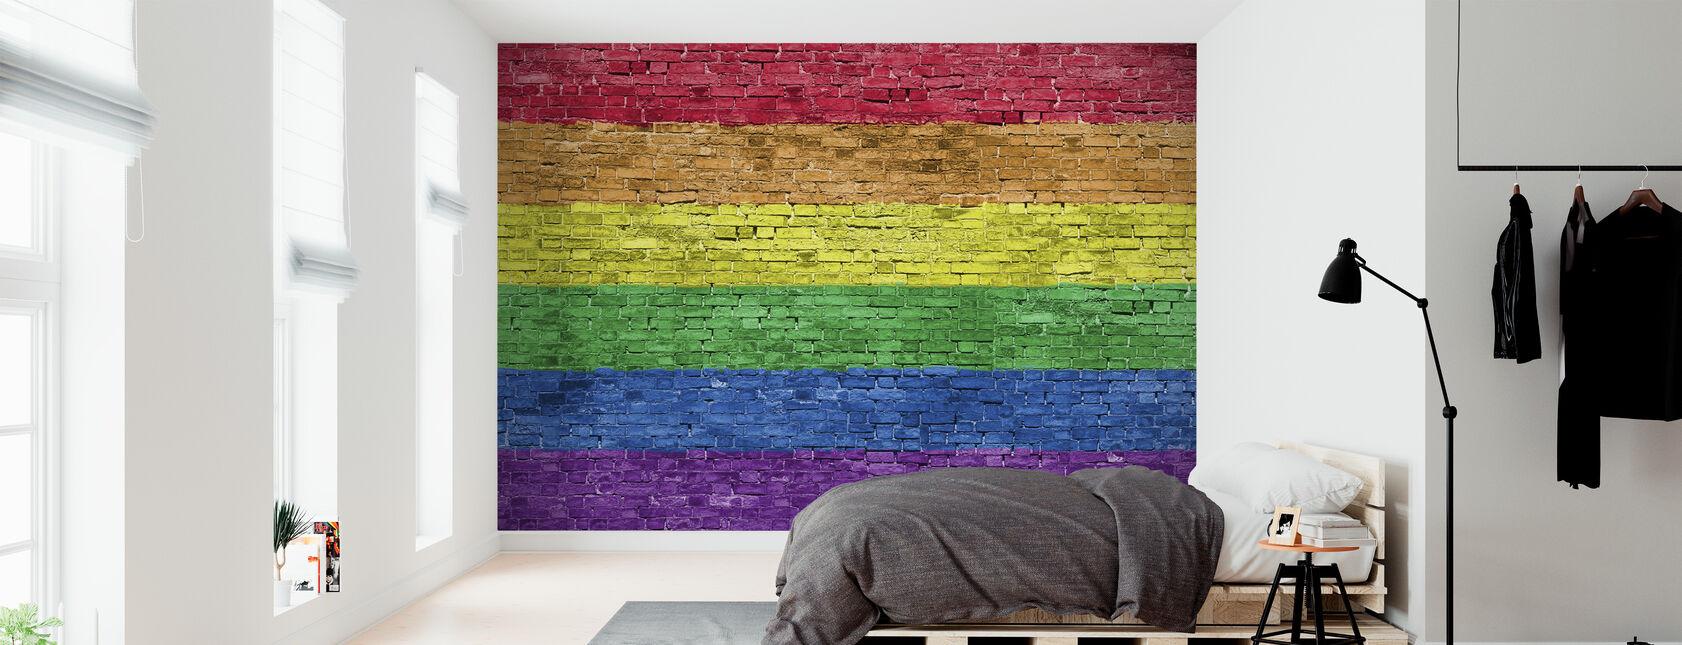 Rainbow graffiti - Tapet - Soveværelse